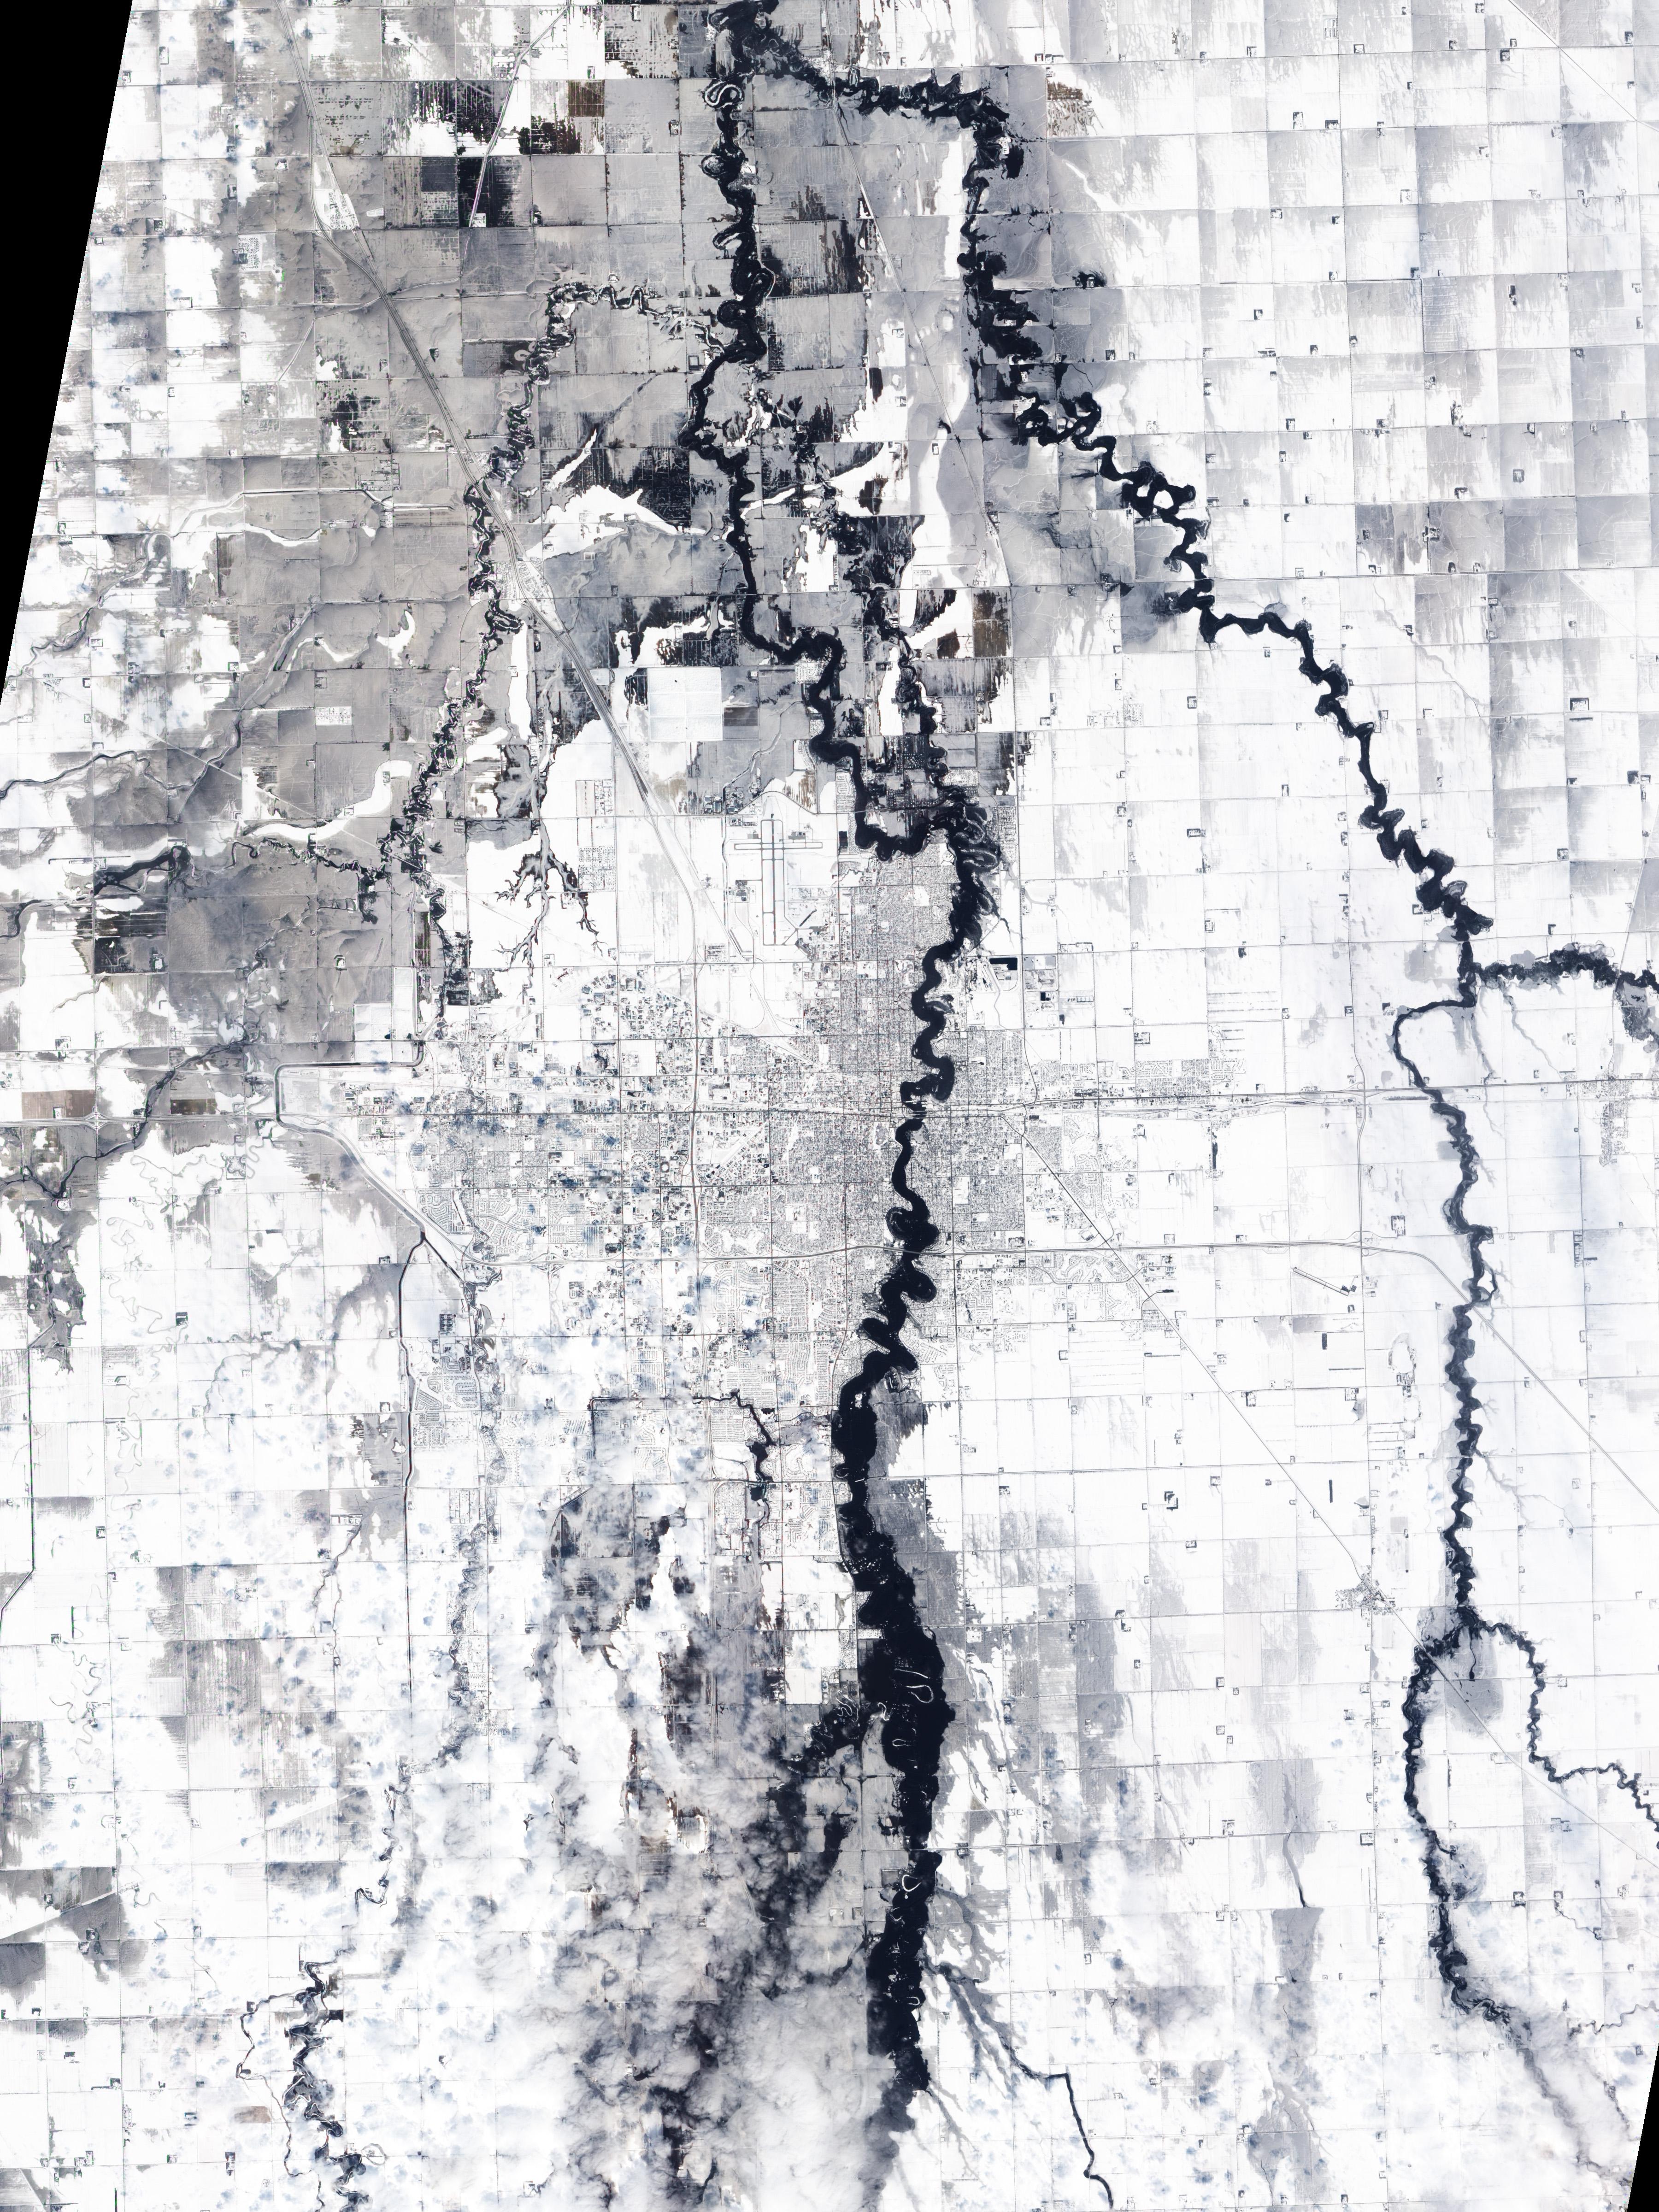 2009 Red River flood - Wikipedia City Of Fargo Flood Map on west fargo city limits map, fargo nd map, fargo minnesota map, fargo flood zone map, fargo interactive flood map, city street map bismarck nd, fargo north dakota street map, fargo north dakota weather map, south fargo map,